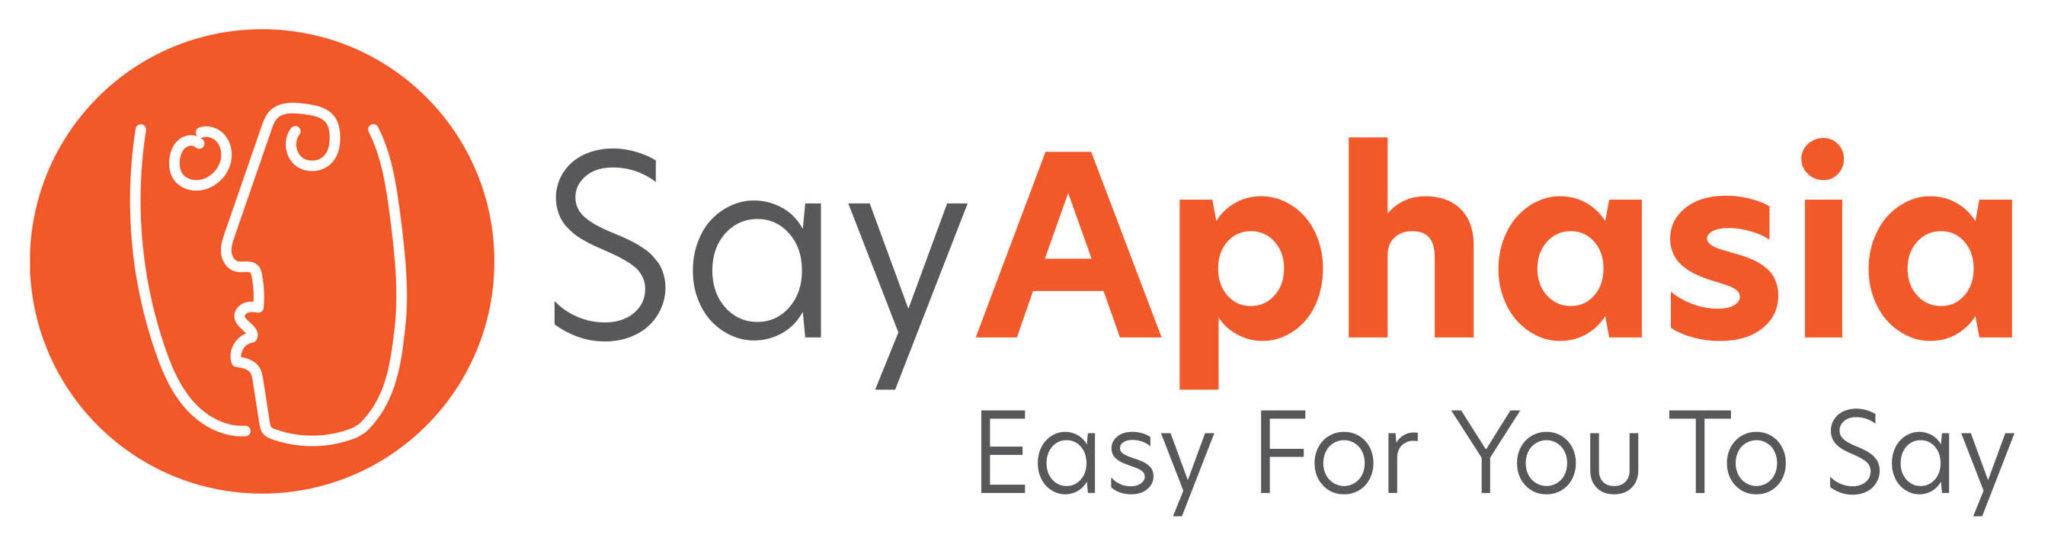 Say Aphasia logo